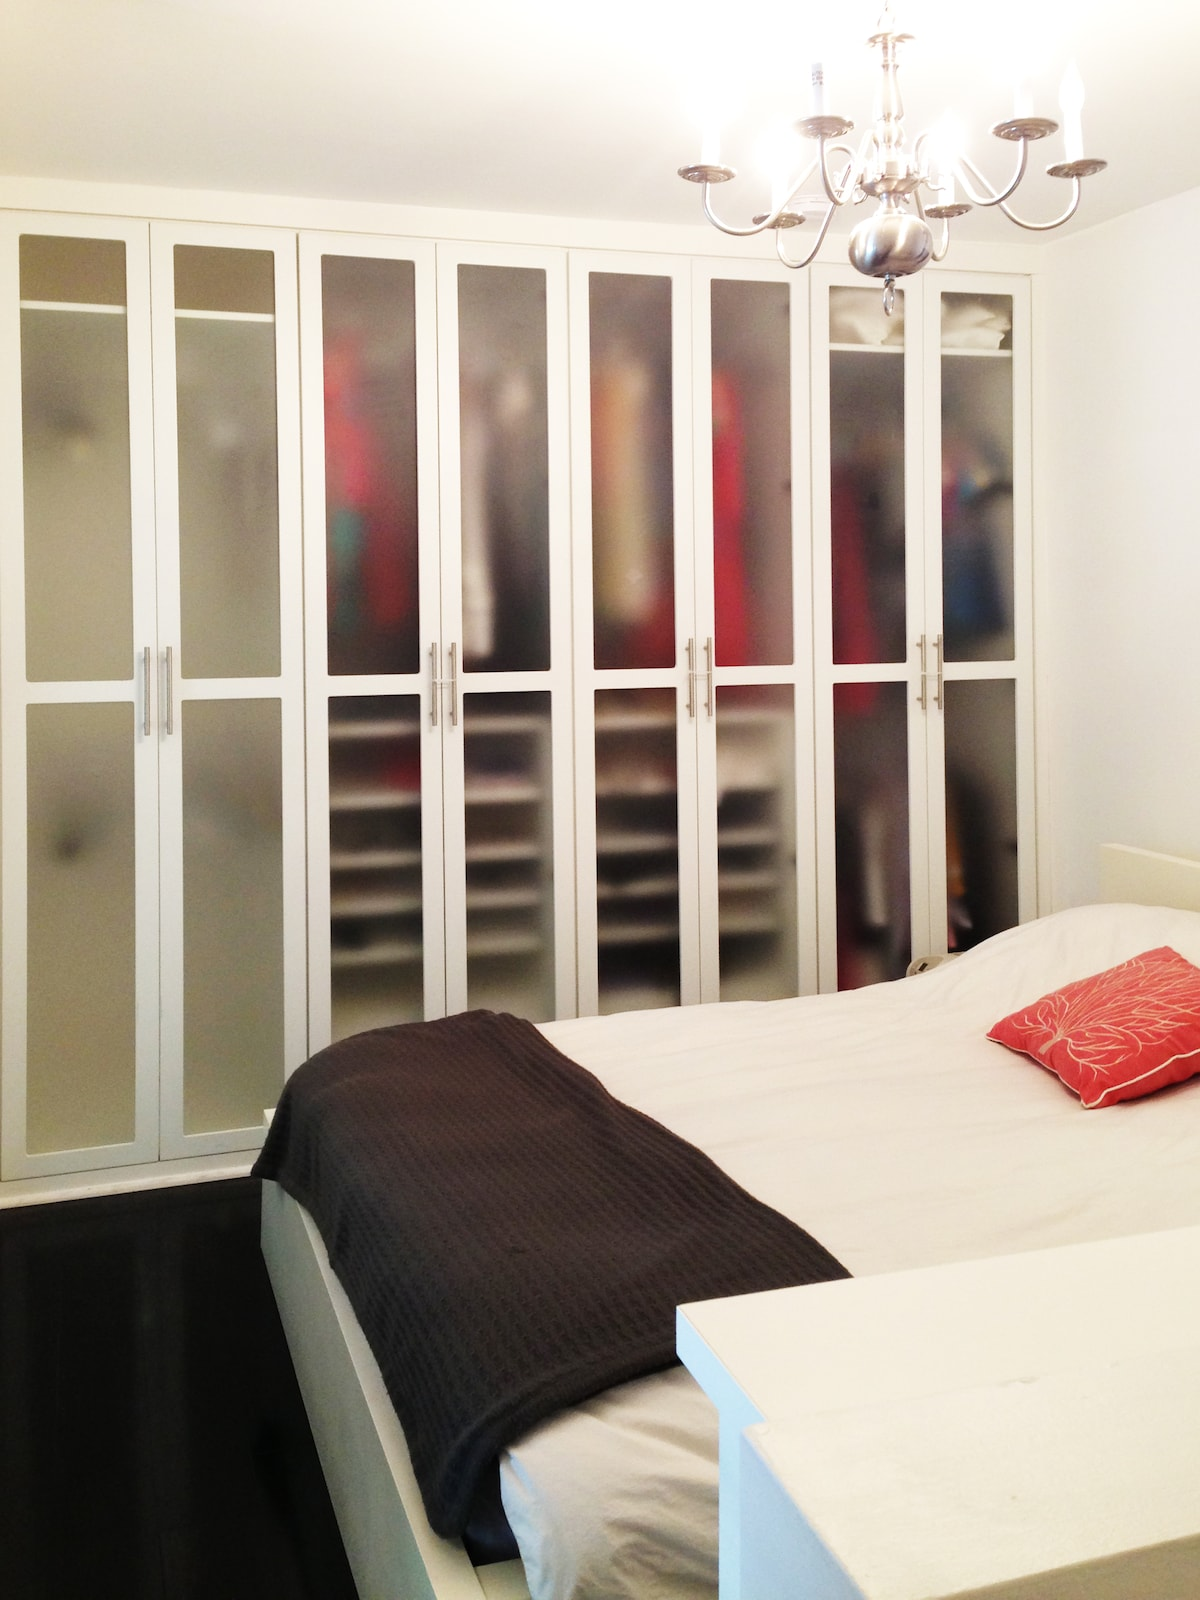 Architect's Studio in South Beach